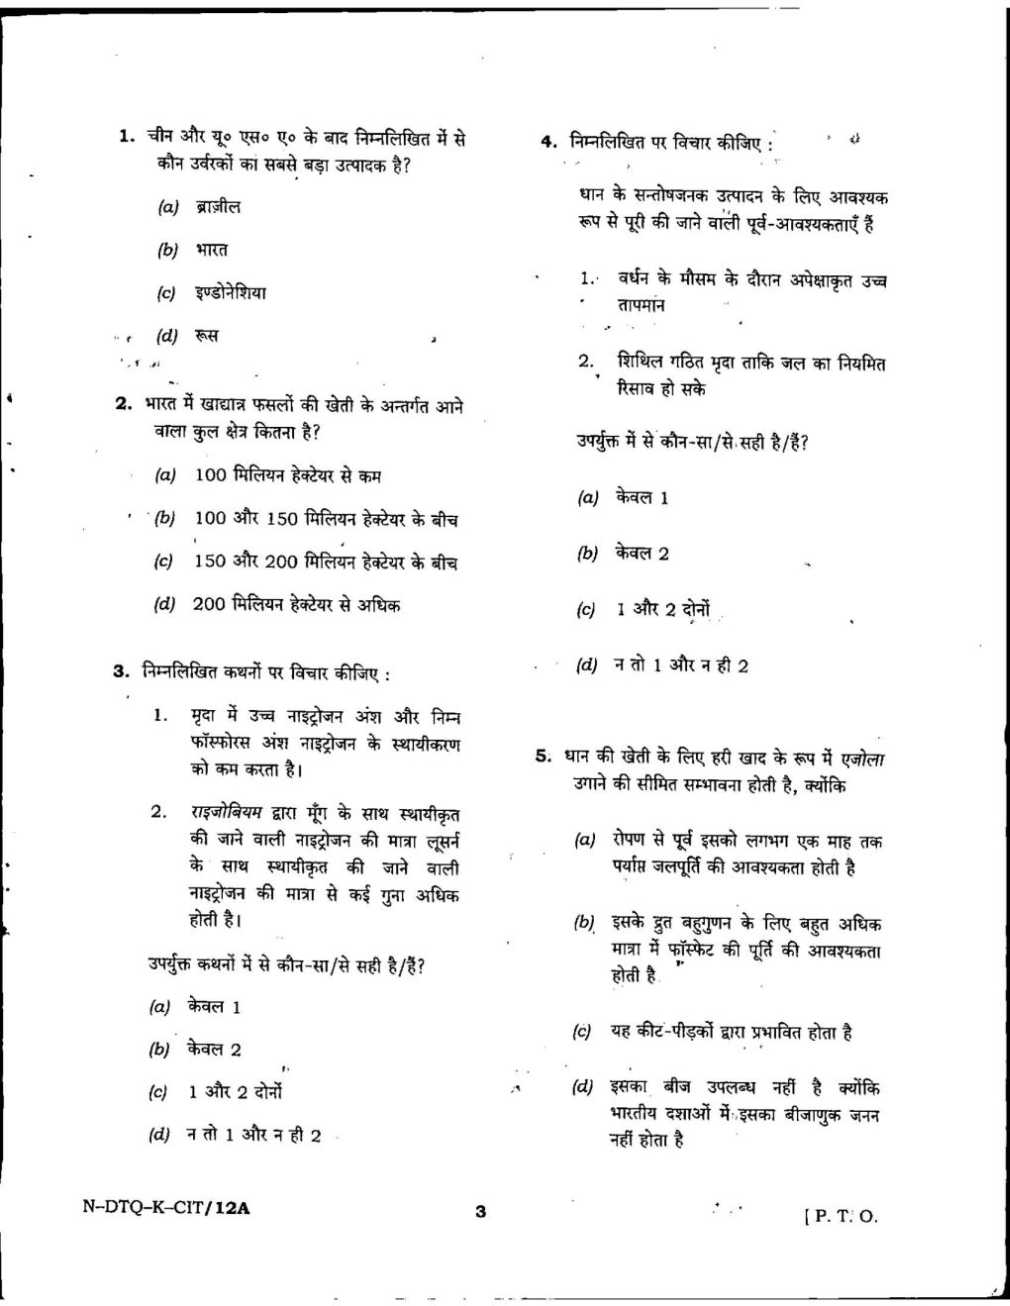 Essay paper in civil services